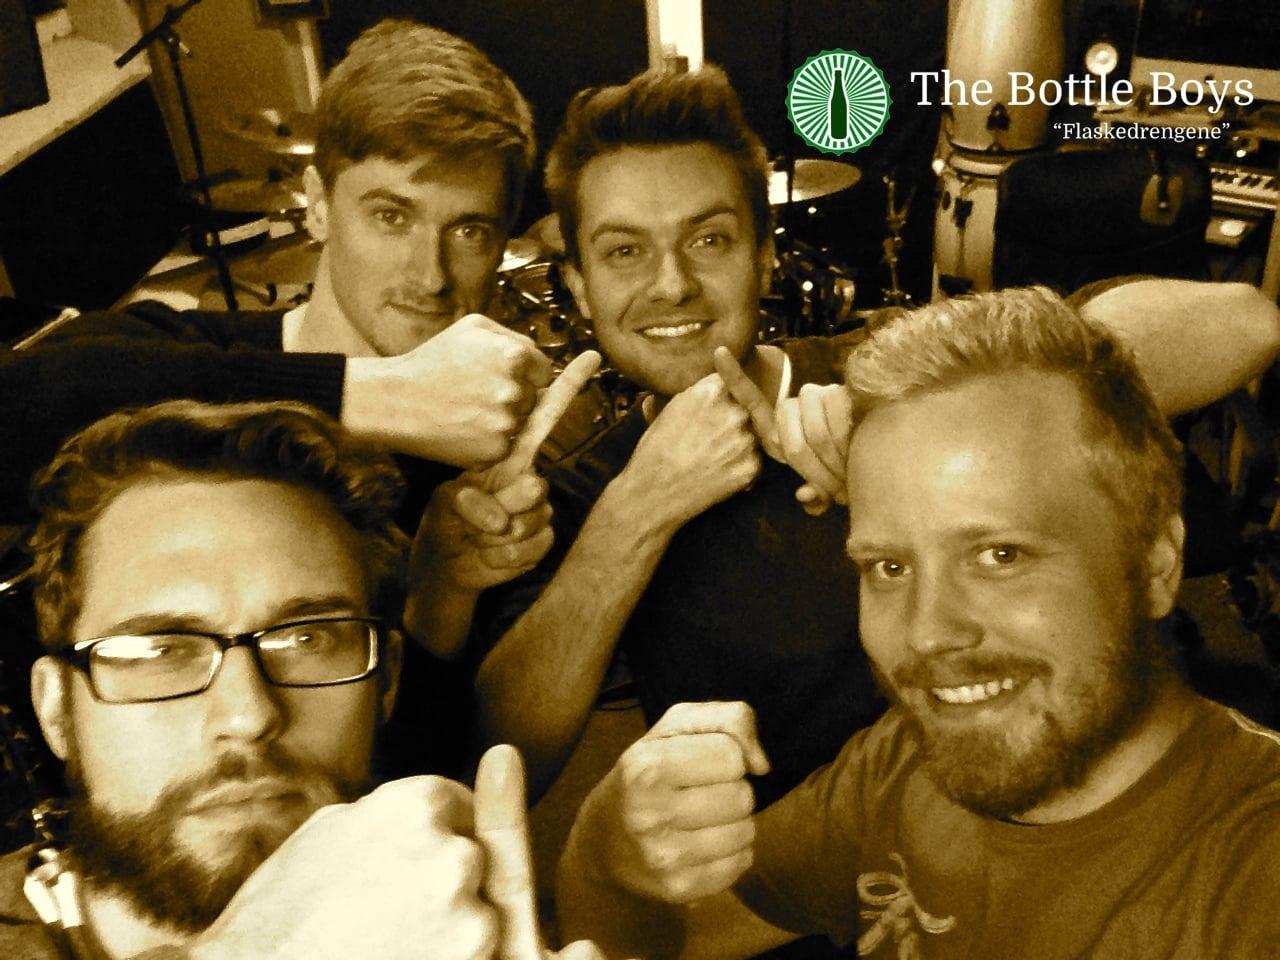 Boombox #3 : The Bottle Boys